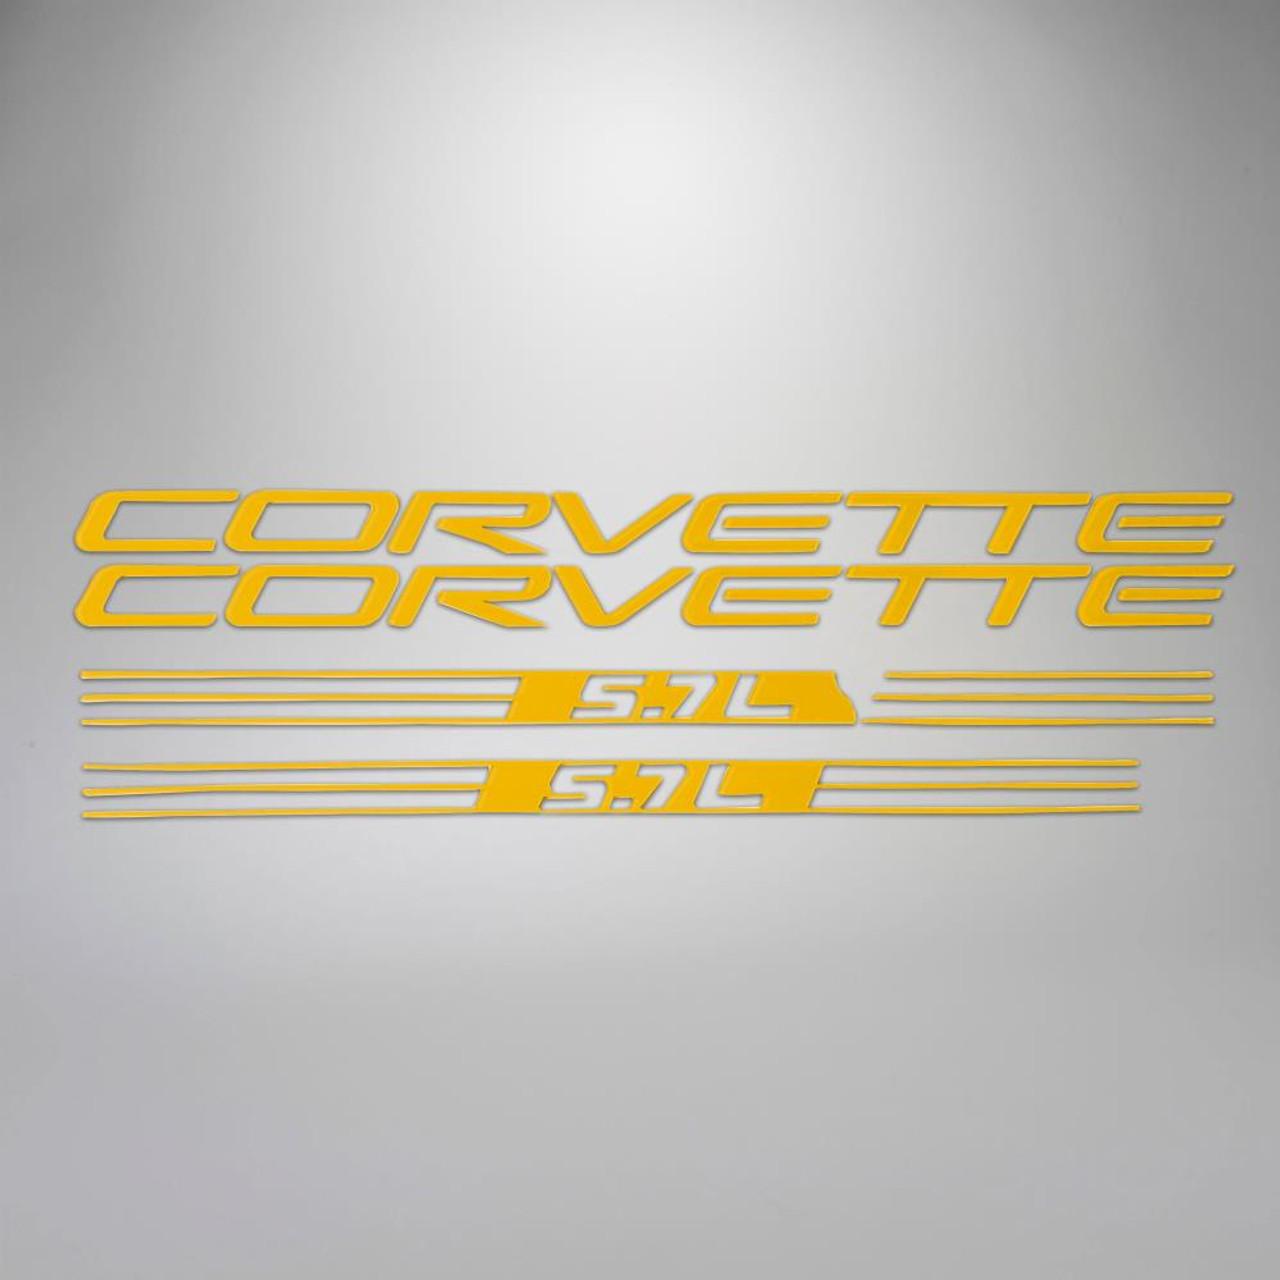 C5 97-98 Corvette 5.7L Fuel Rail Letter Kit - Yellow